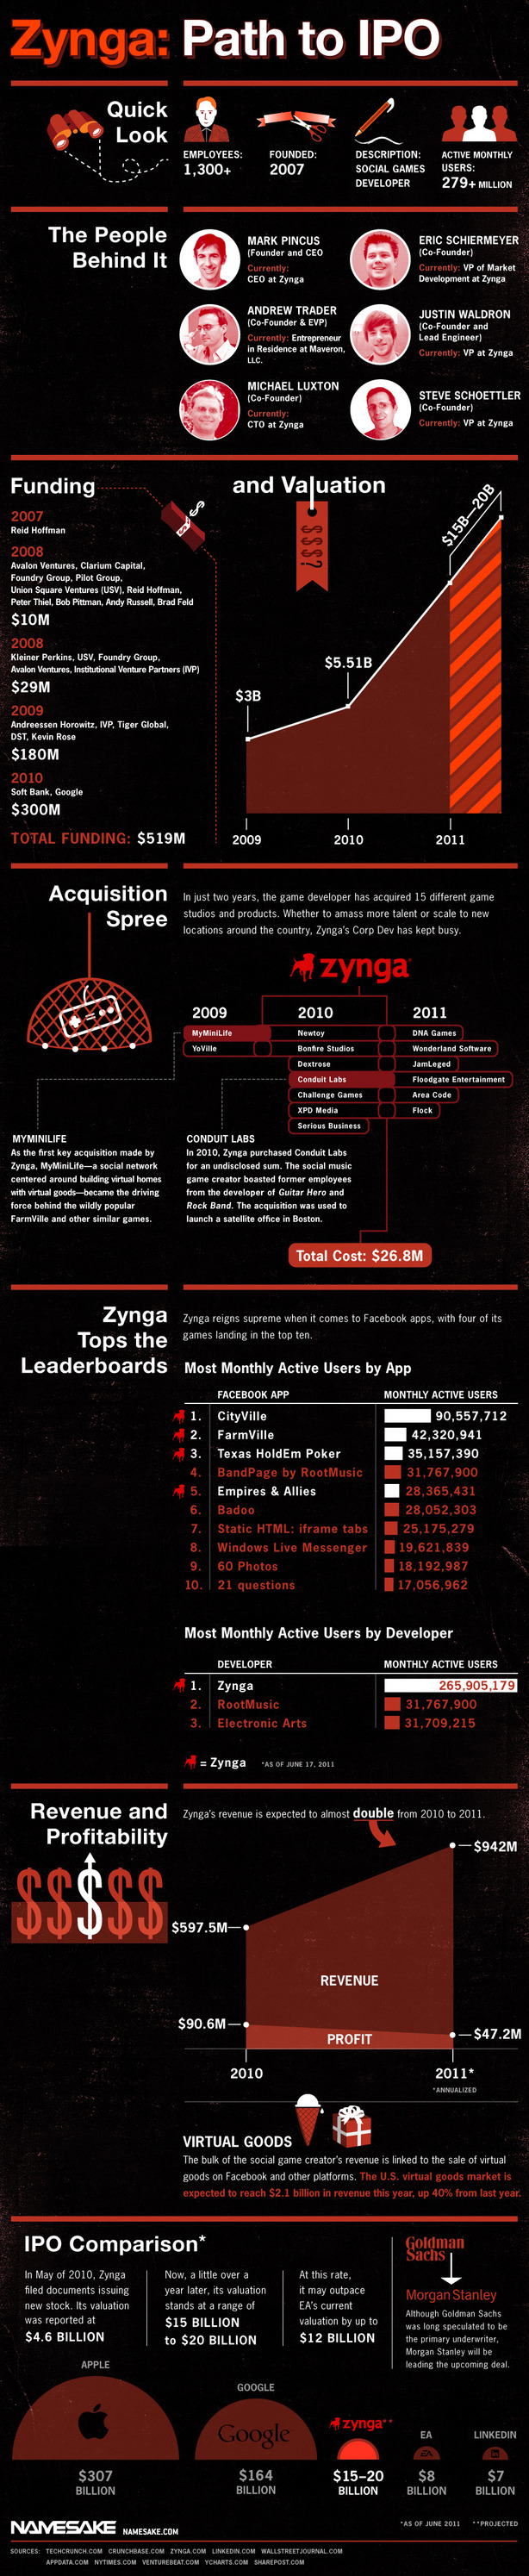 Zynga's Path to IPO